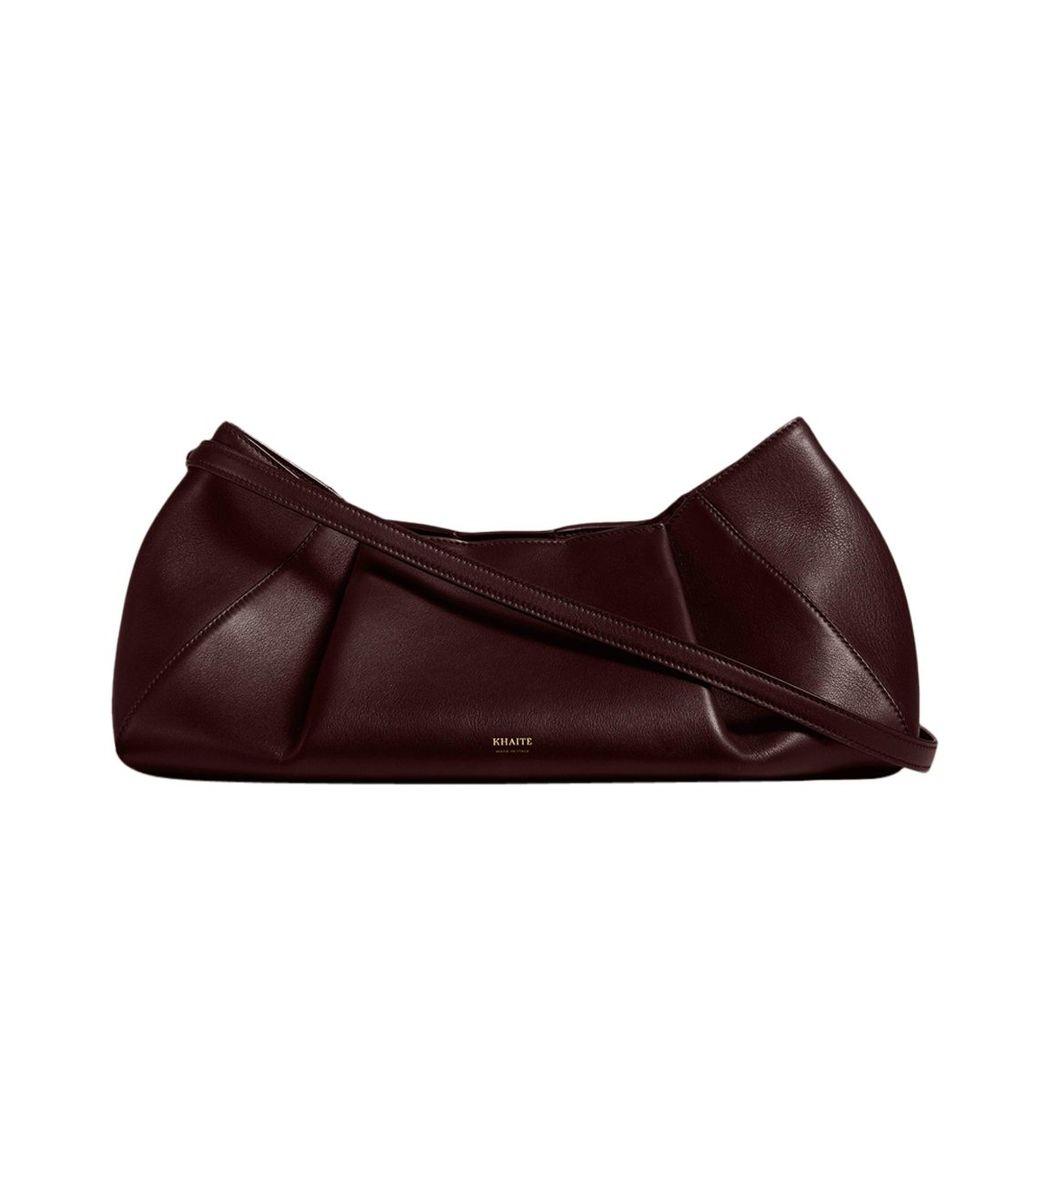 Khaite Jeanne Small Crossbody Bag